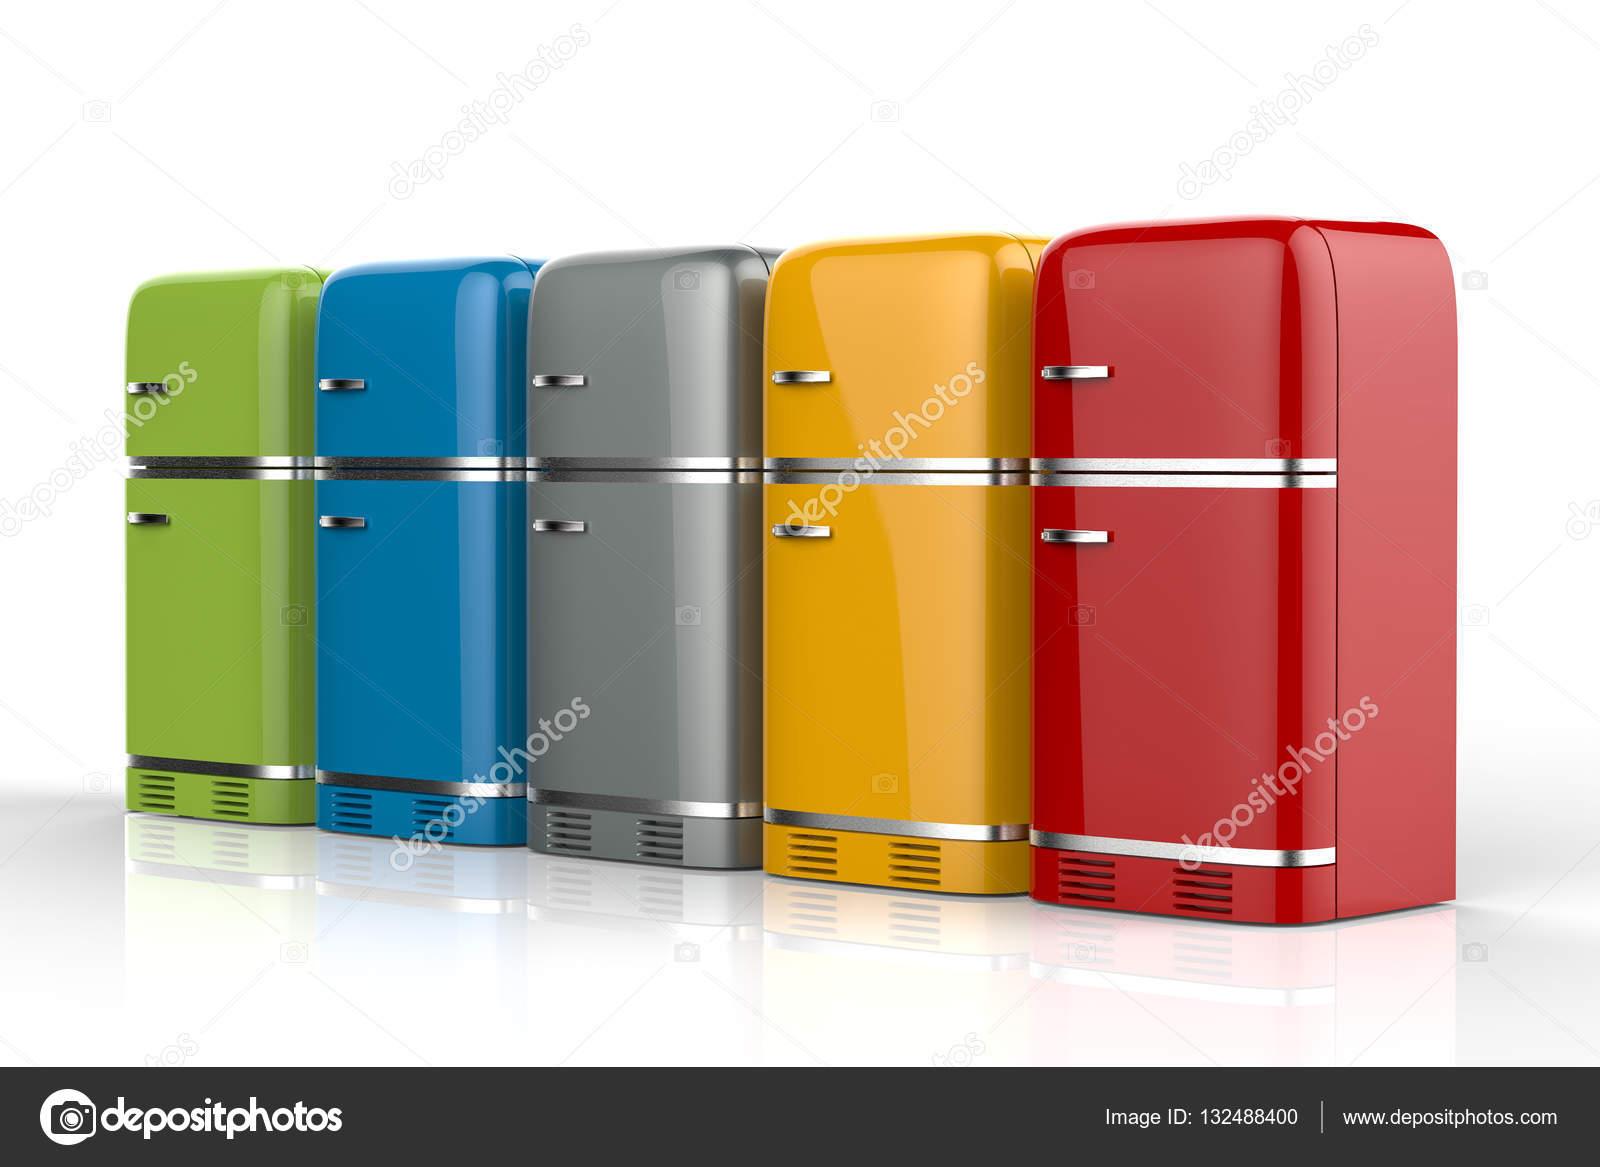 Kühlschränke in Folge — Stockfoto © phonlamai #132488400